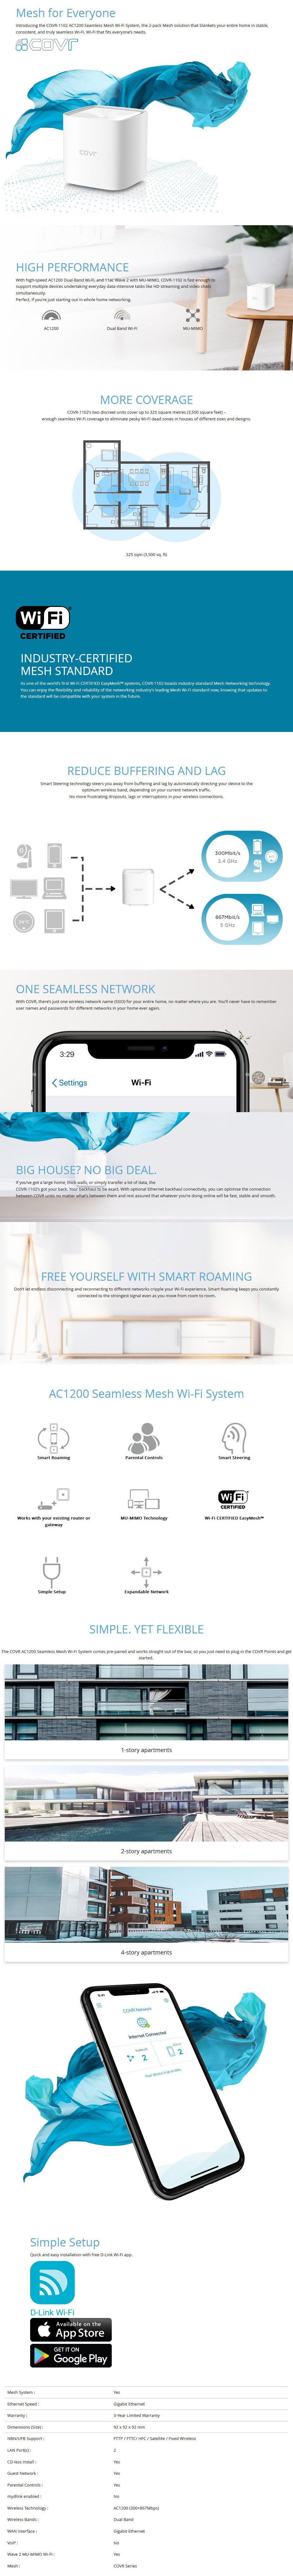 dlink-covr1100-ac1200-seamless-mesh-wifi-router-ac34947-6-1-.jpg